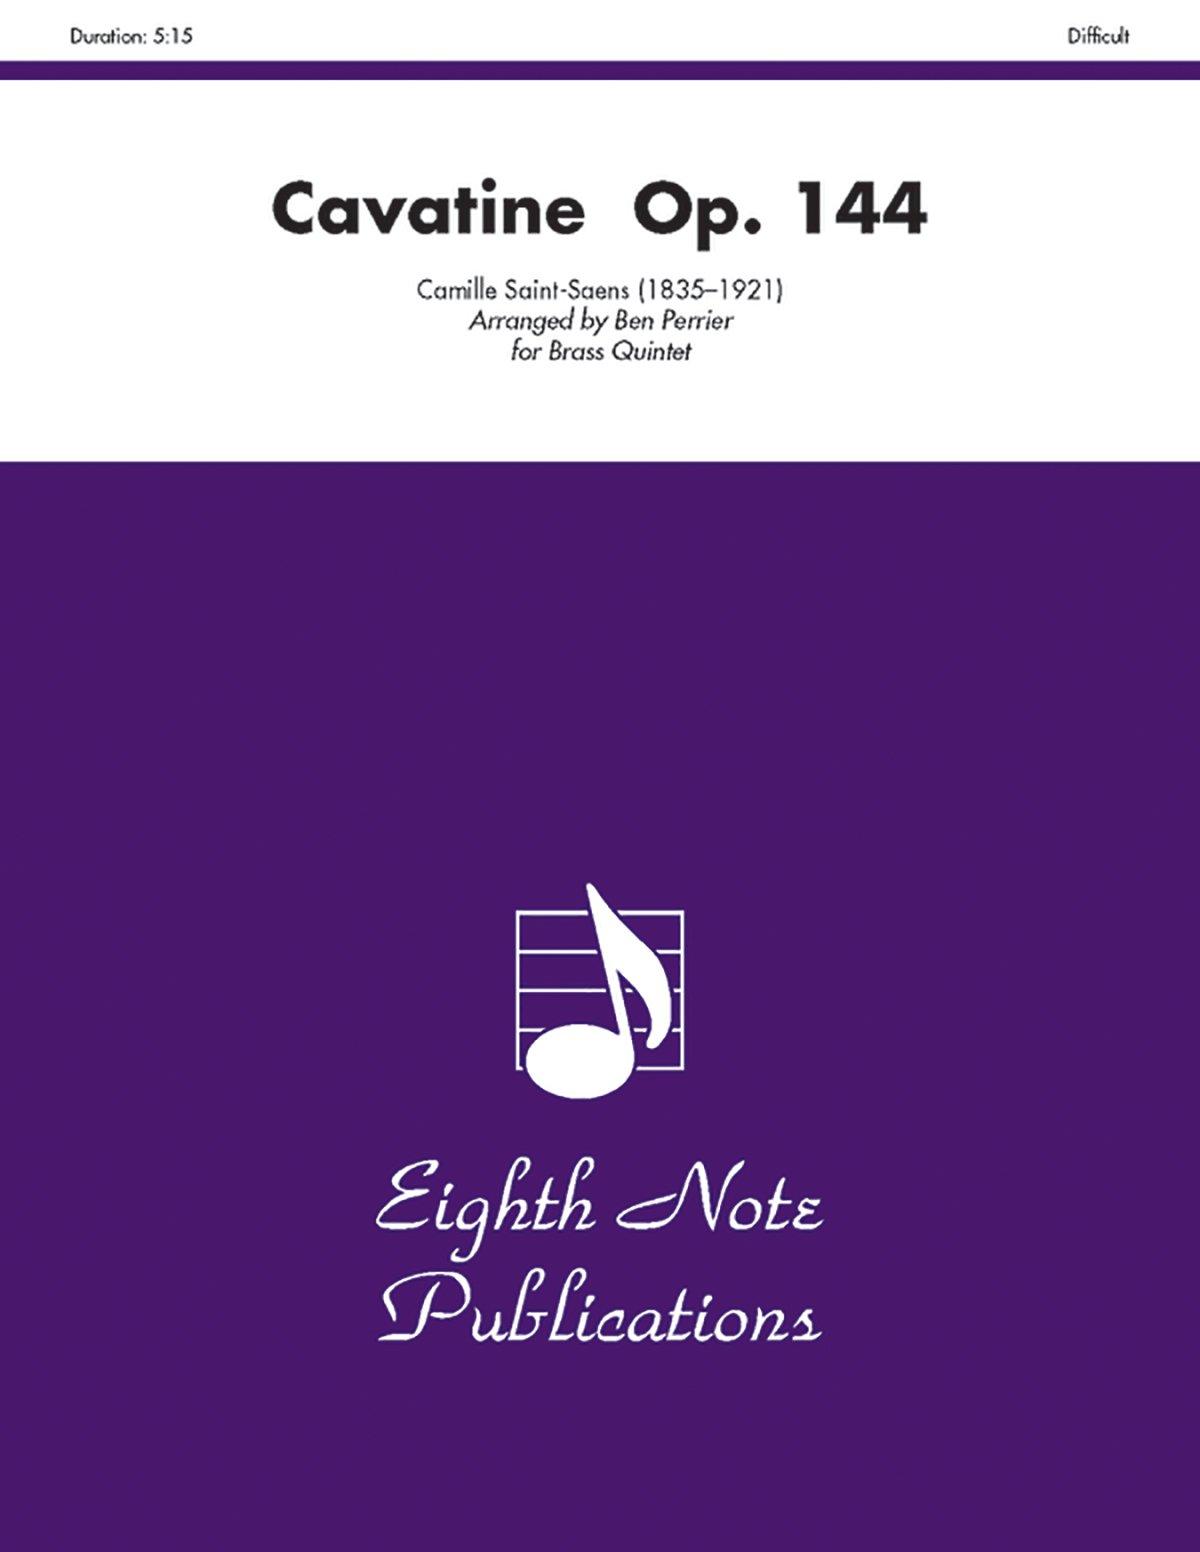 Cavatine, Op. 144: Trombone Feature, Score & Parts (Eighth Note Publications)